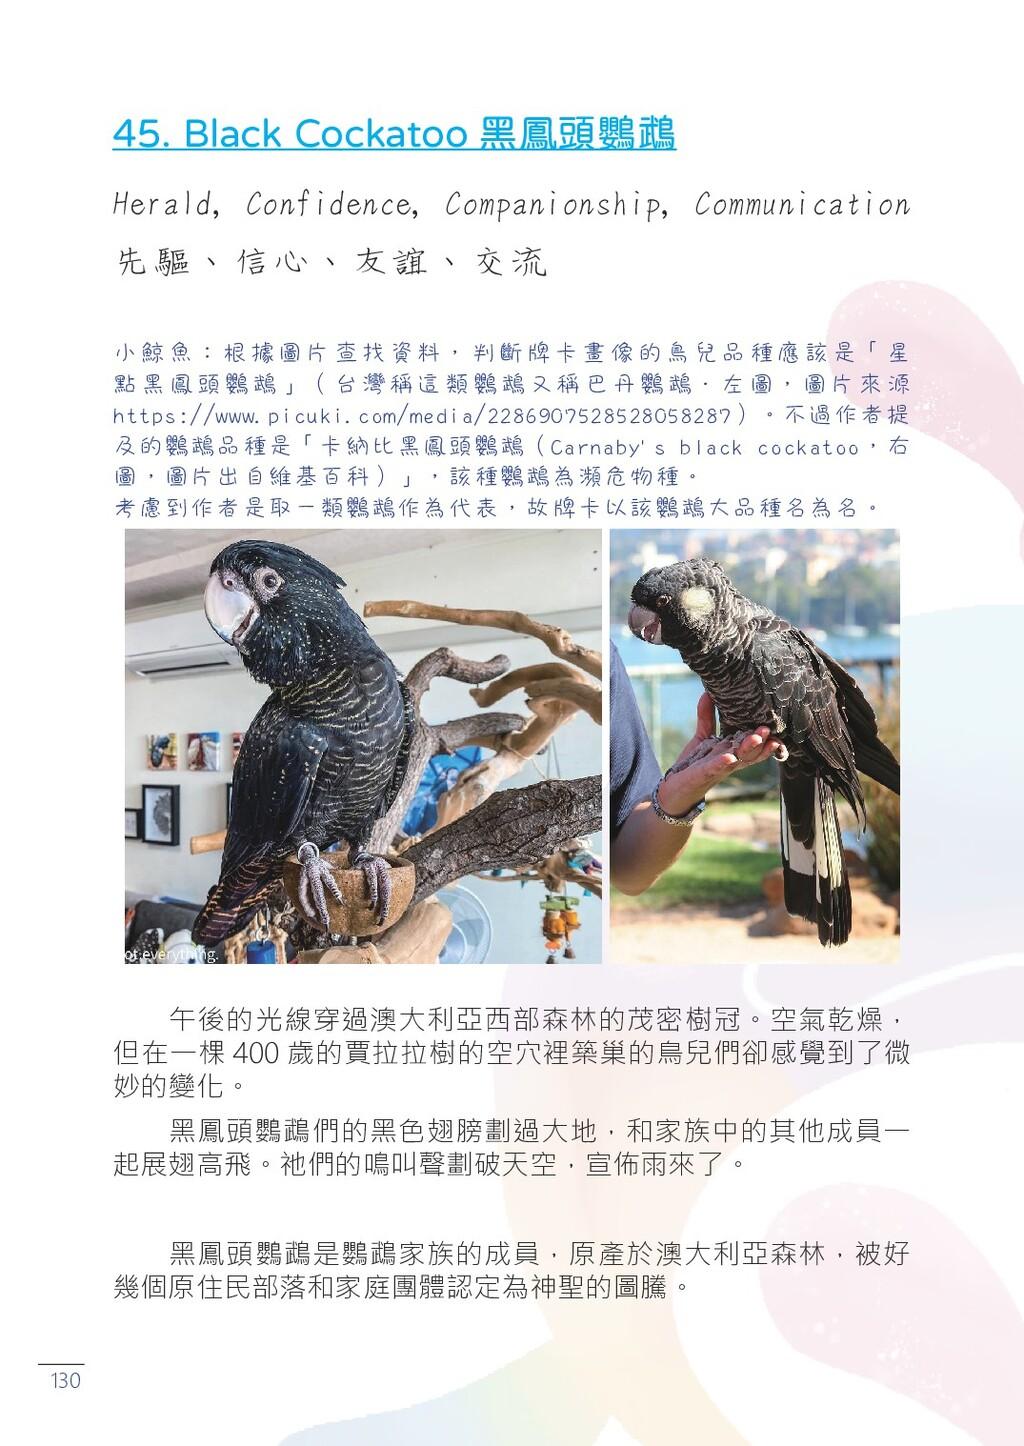 130 45. Black Cockatoo 黑鳳頭鸚鵡 Herald, Confidence...